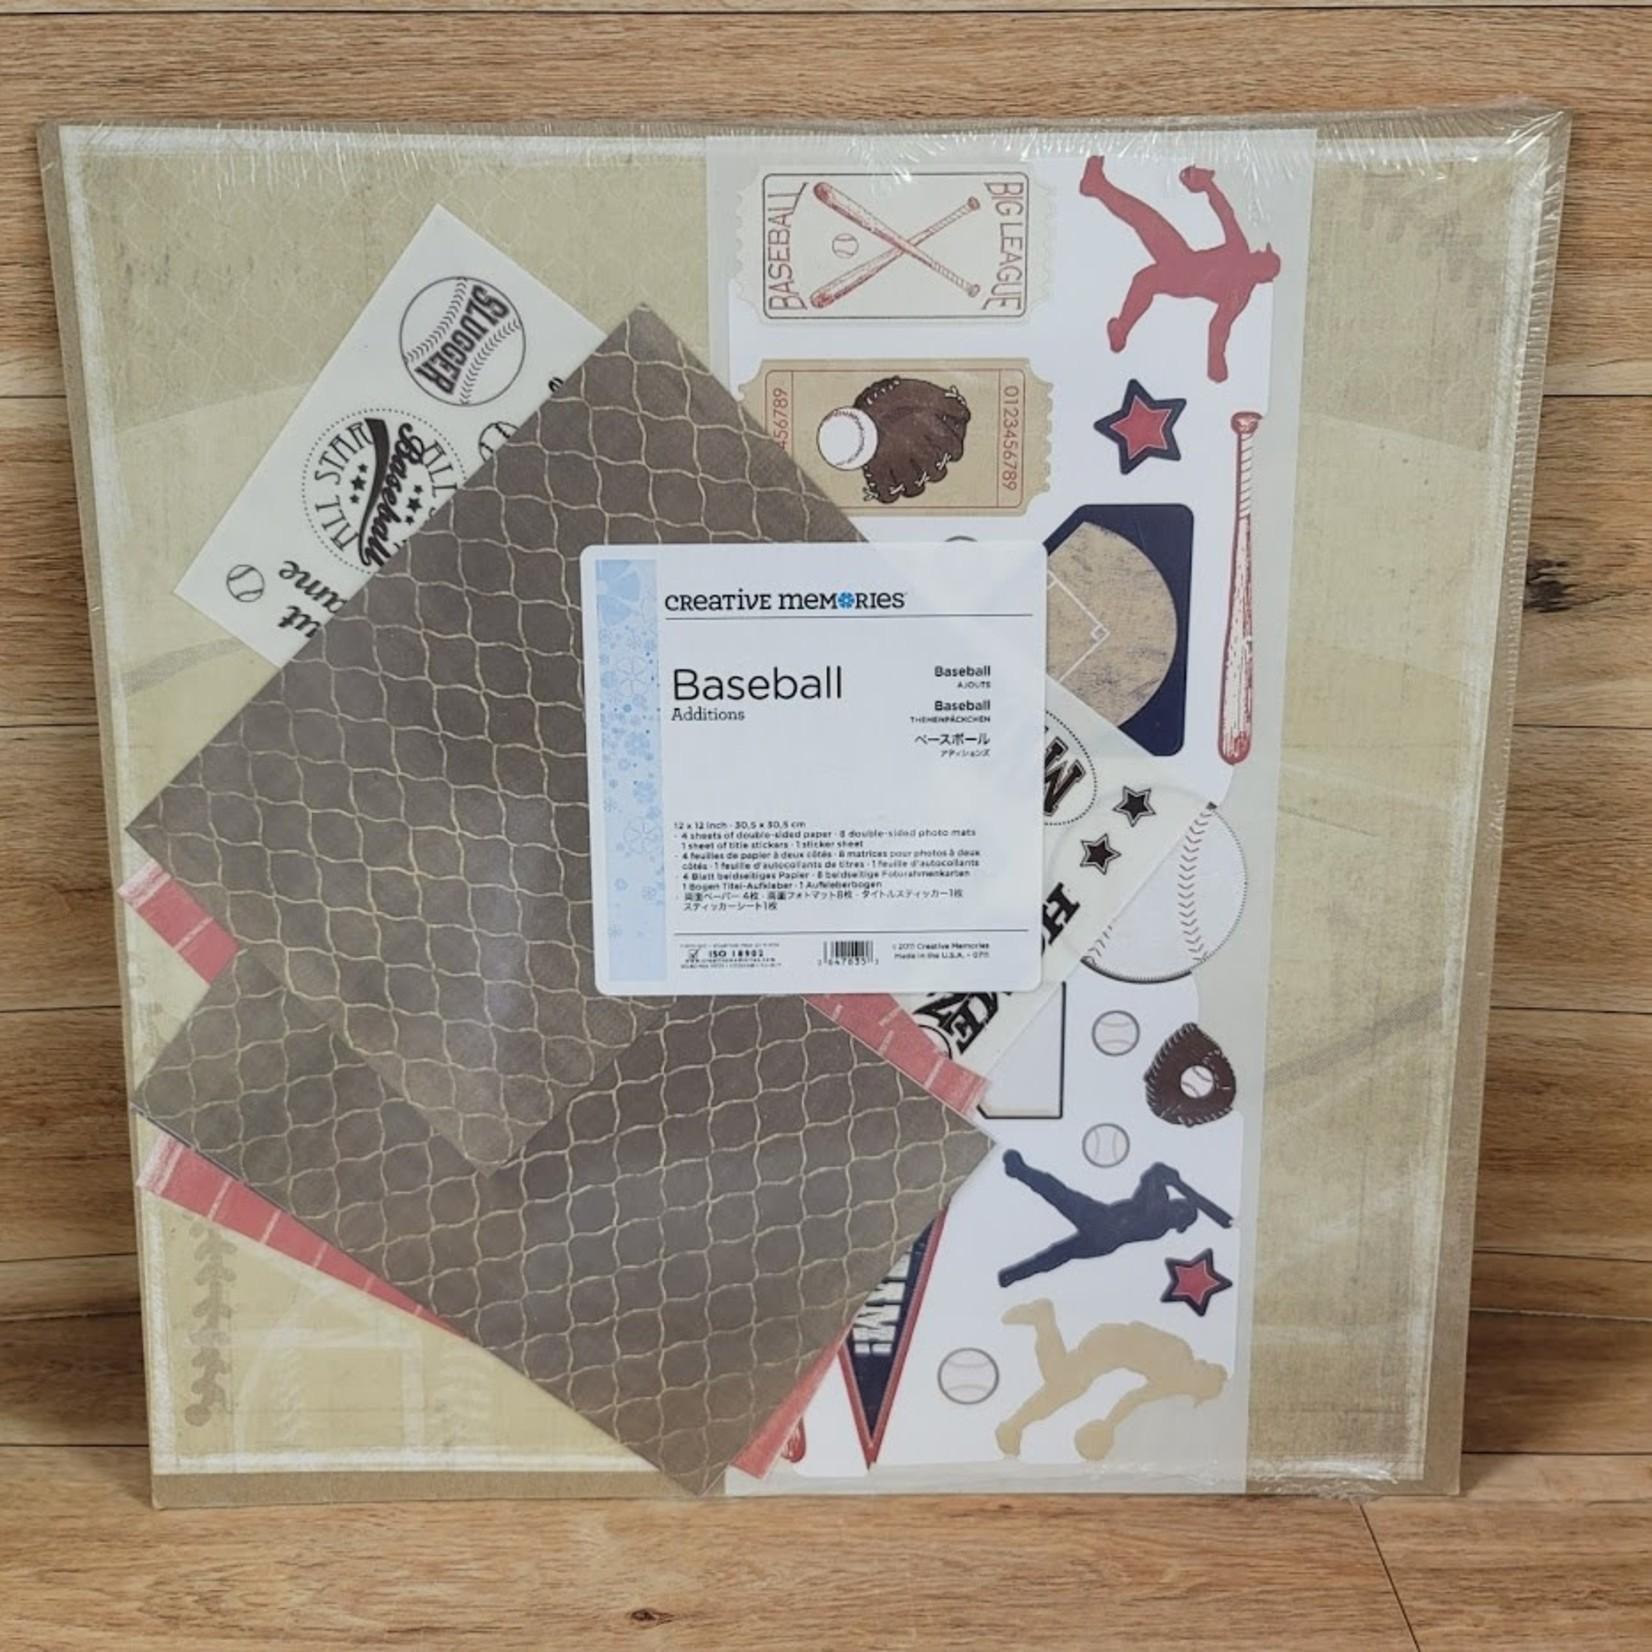 Creative Memories Creative Memories - Additions - Baseball